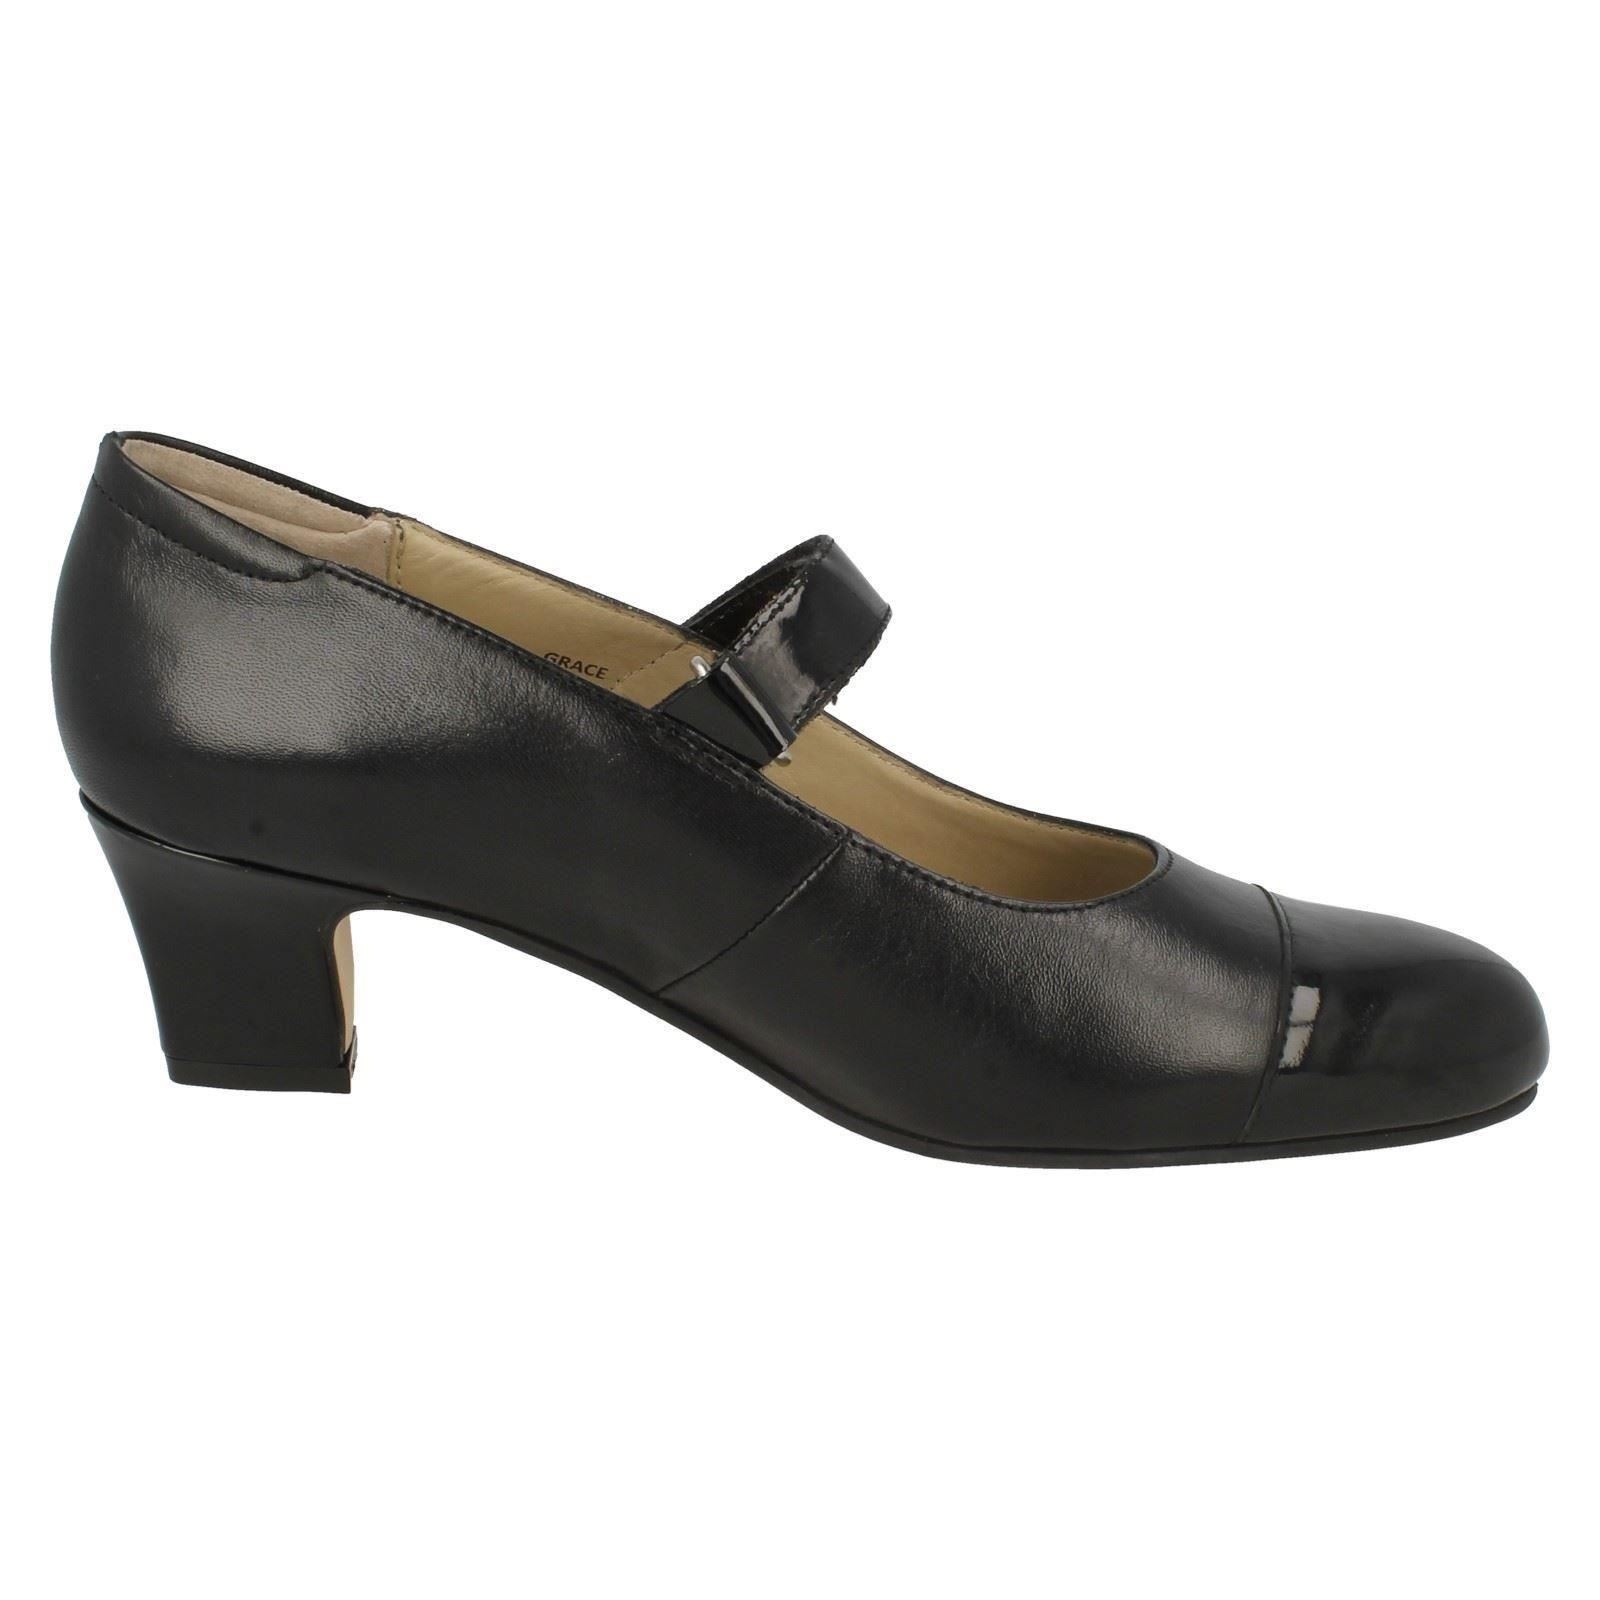 Equity nerovernice Ladies Grace cinturino Smart con Shoes mv8nw0PyNO